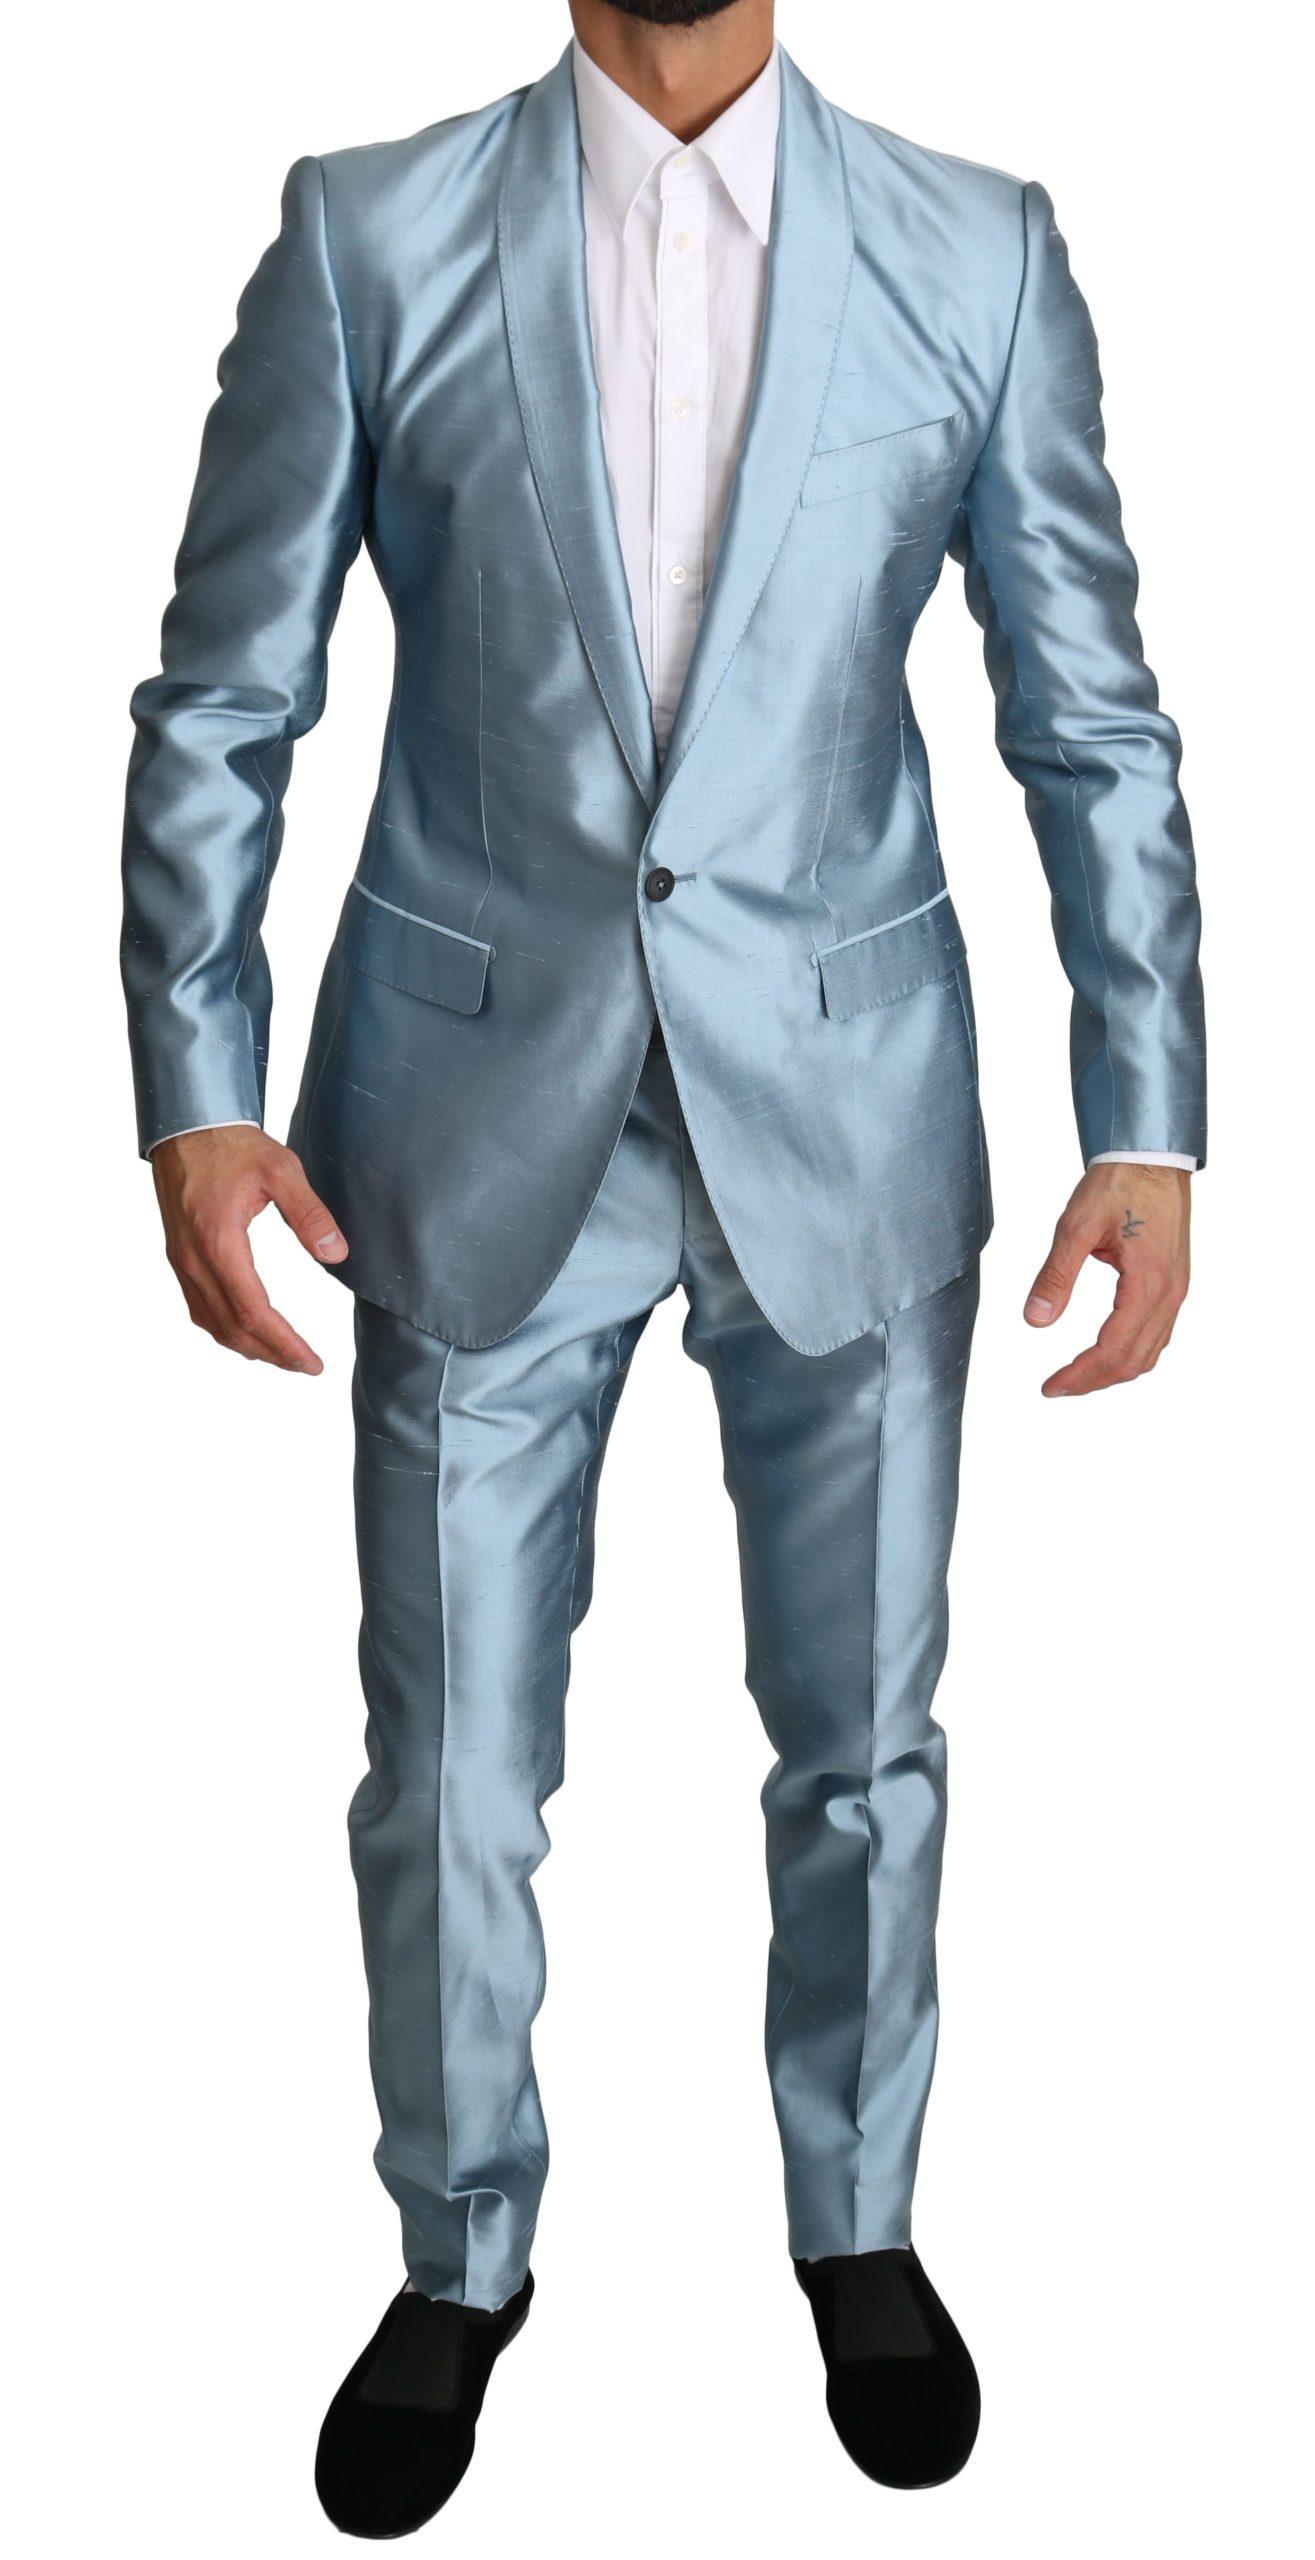 Dolce & Gabbana Men's Metallic 2 Piece MARTINI Suit Gray Light-blue KOS1553 - IT54 | XL